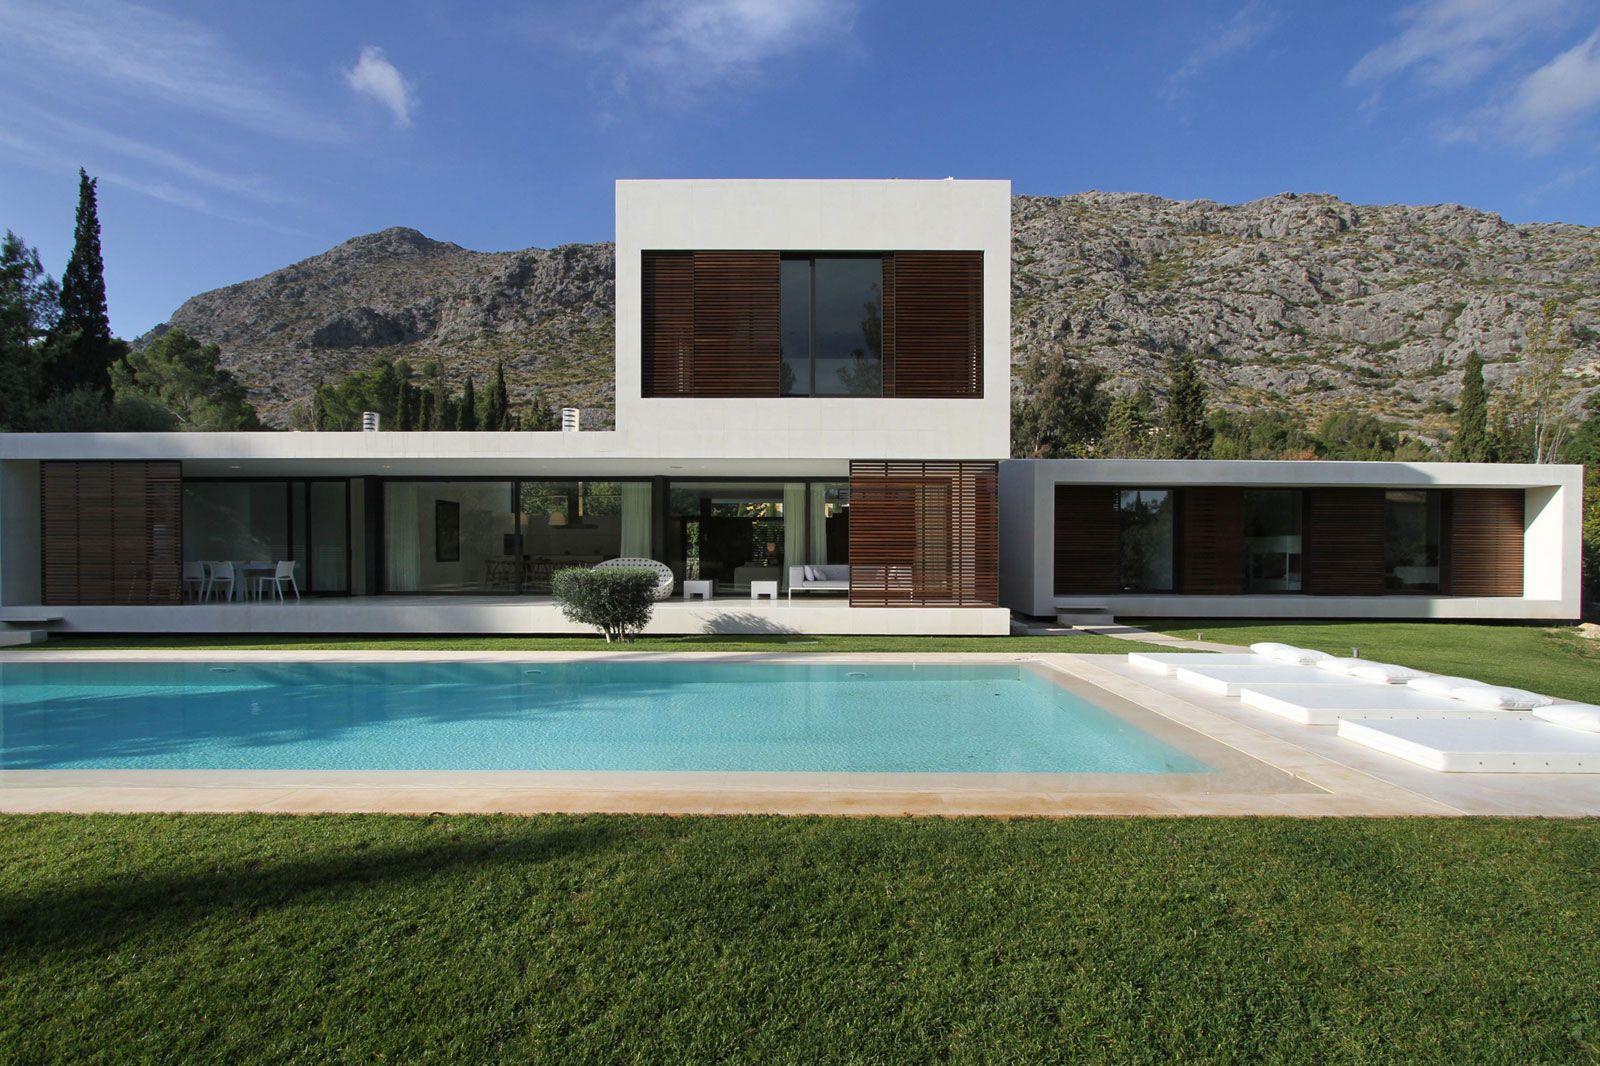 Casa-Bauzà-00-1